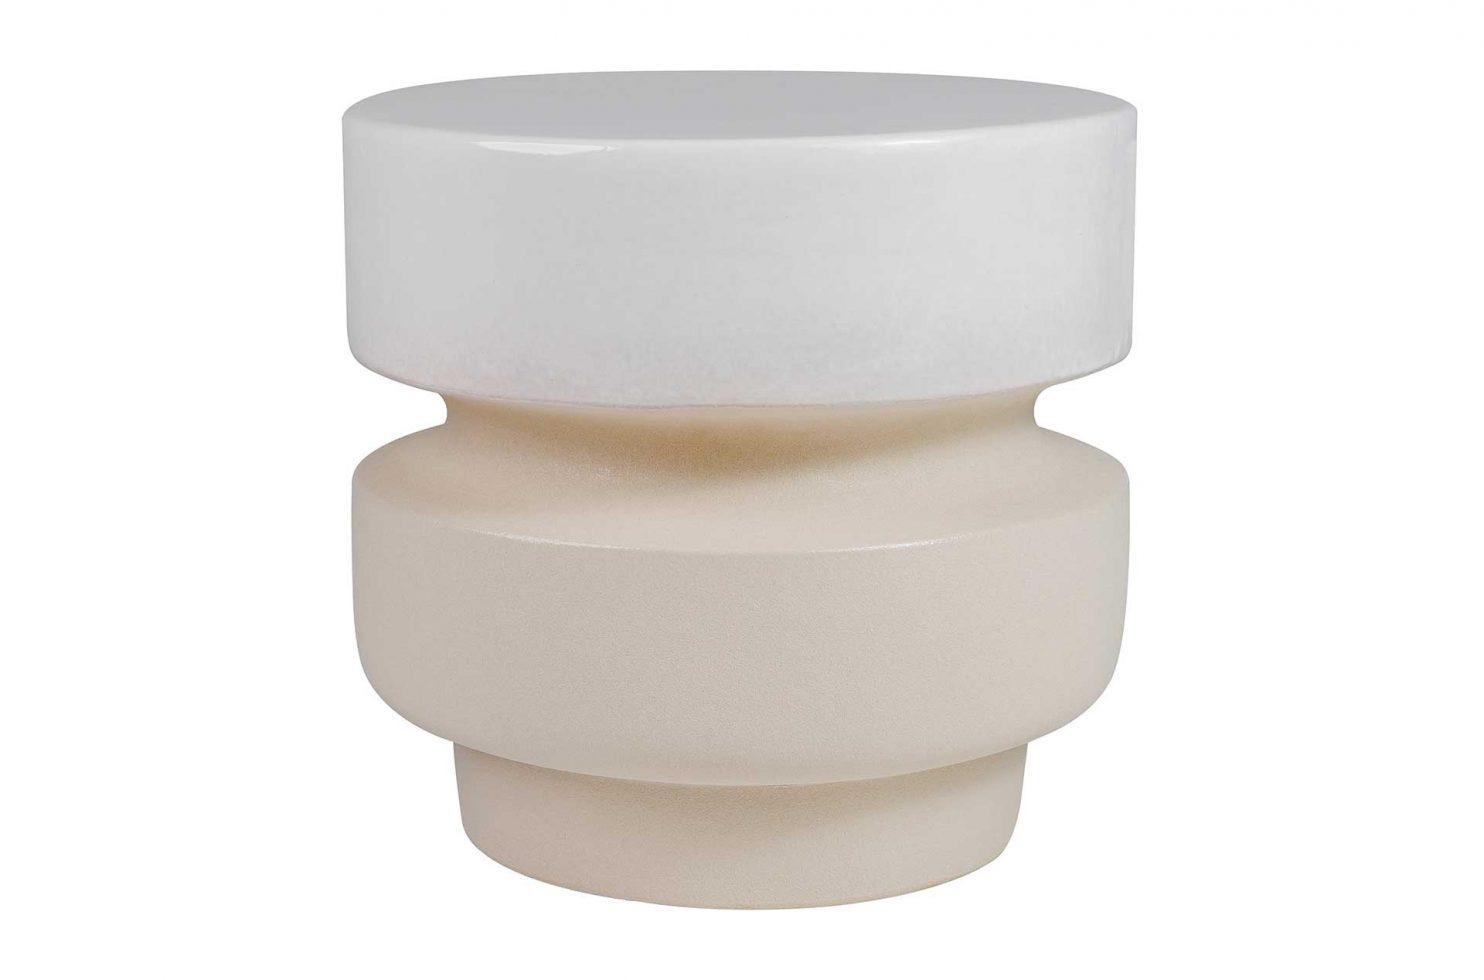 prov cer balance stool 16in C3080403435 linen sand 1 main web